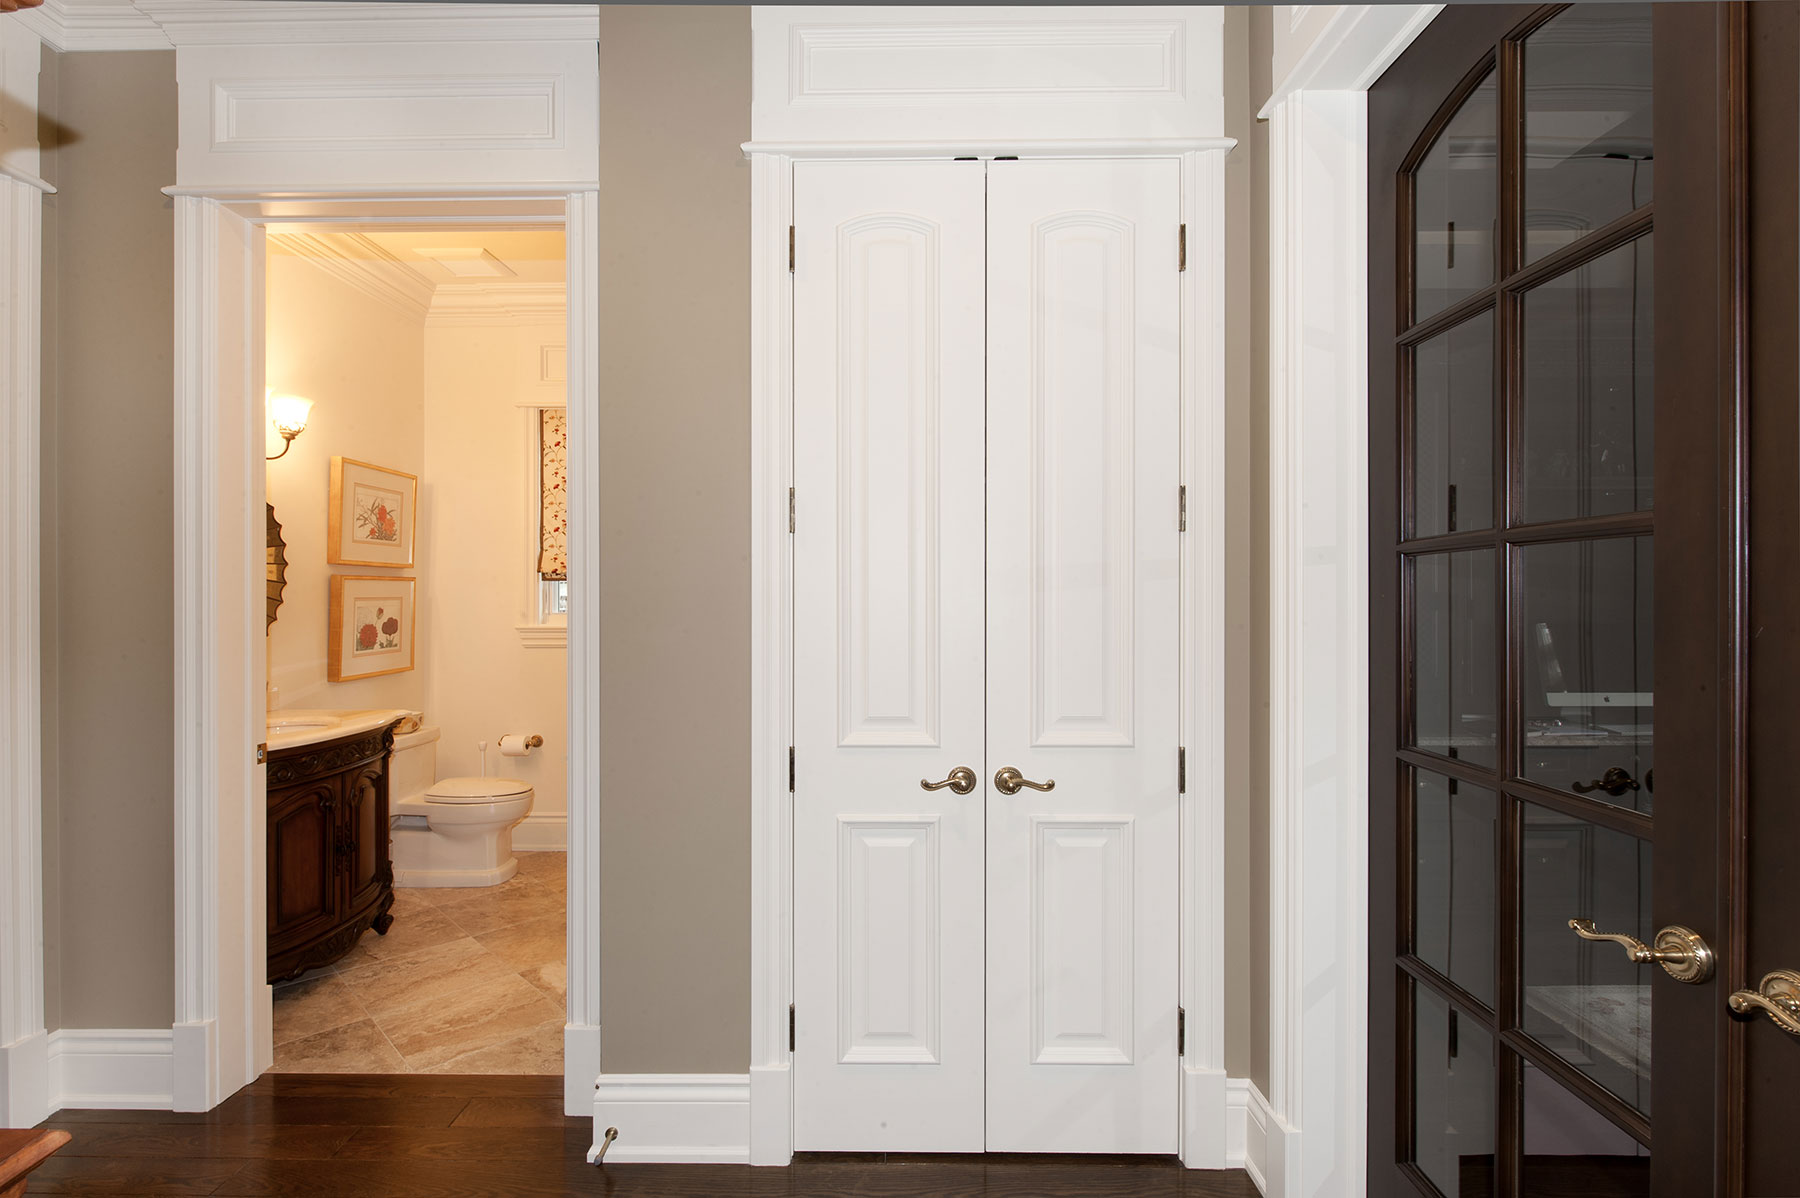 Custom Wood Interior Doors | Custom Interior Double Door, 2 Raised Panel with Raided Moulding White Painted  - Glenview Doors - Custom Doors in Chicago